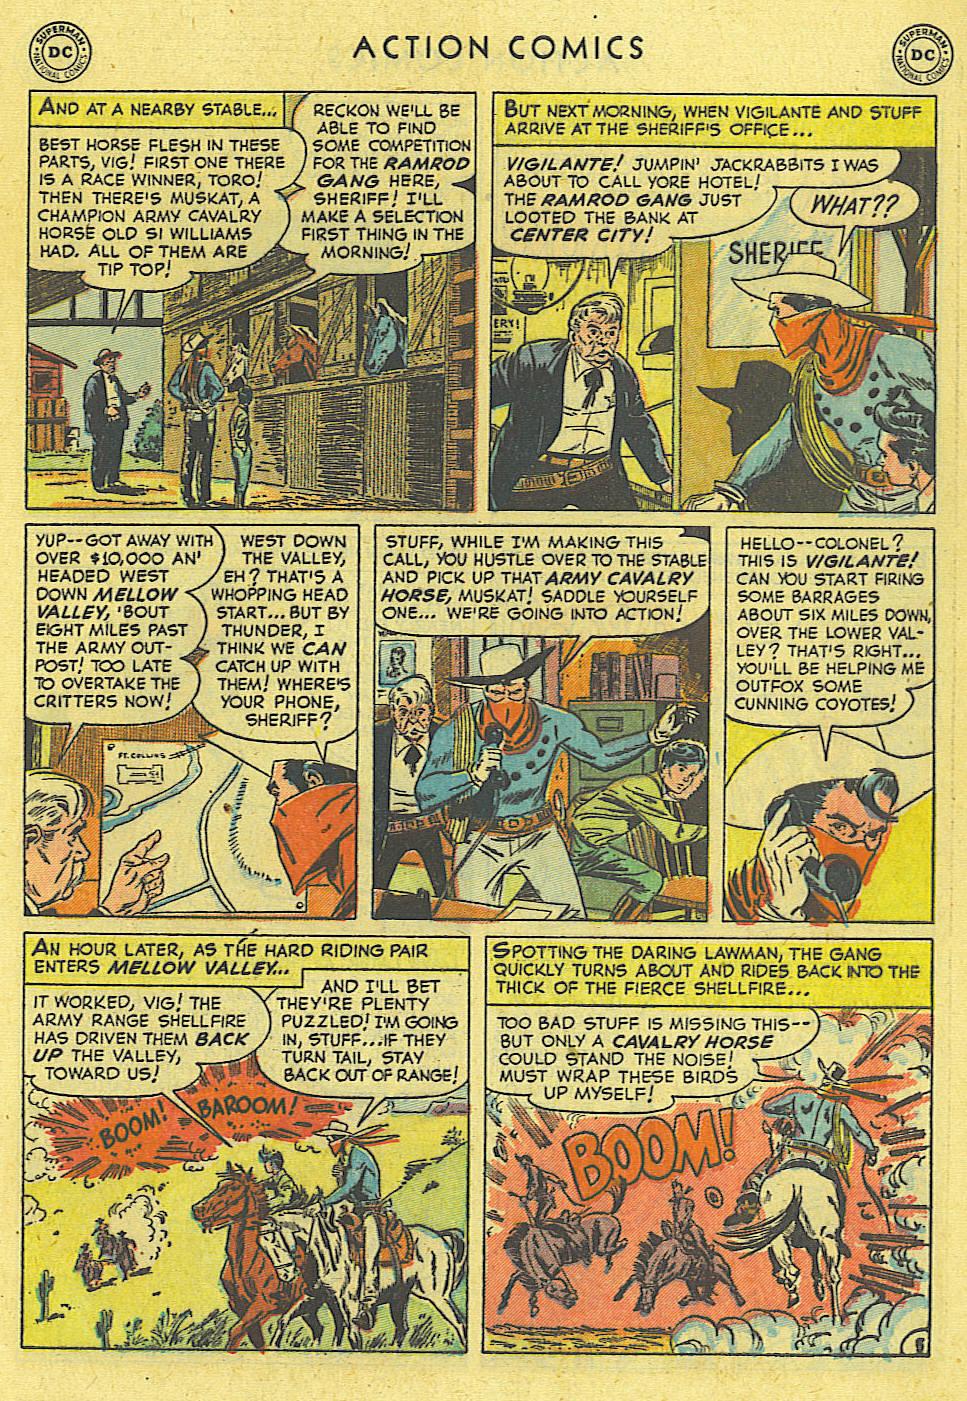 Action Comics (1938) 162 Page 30